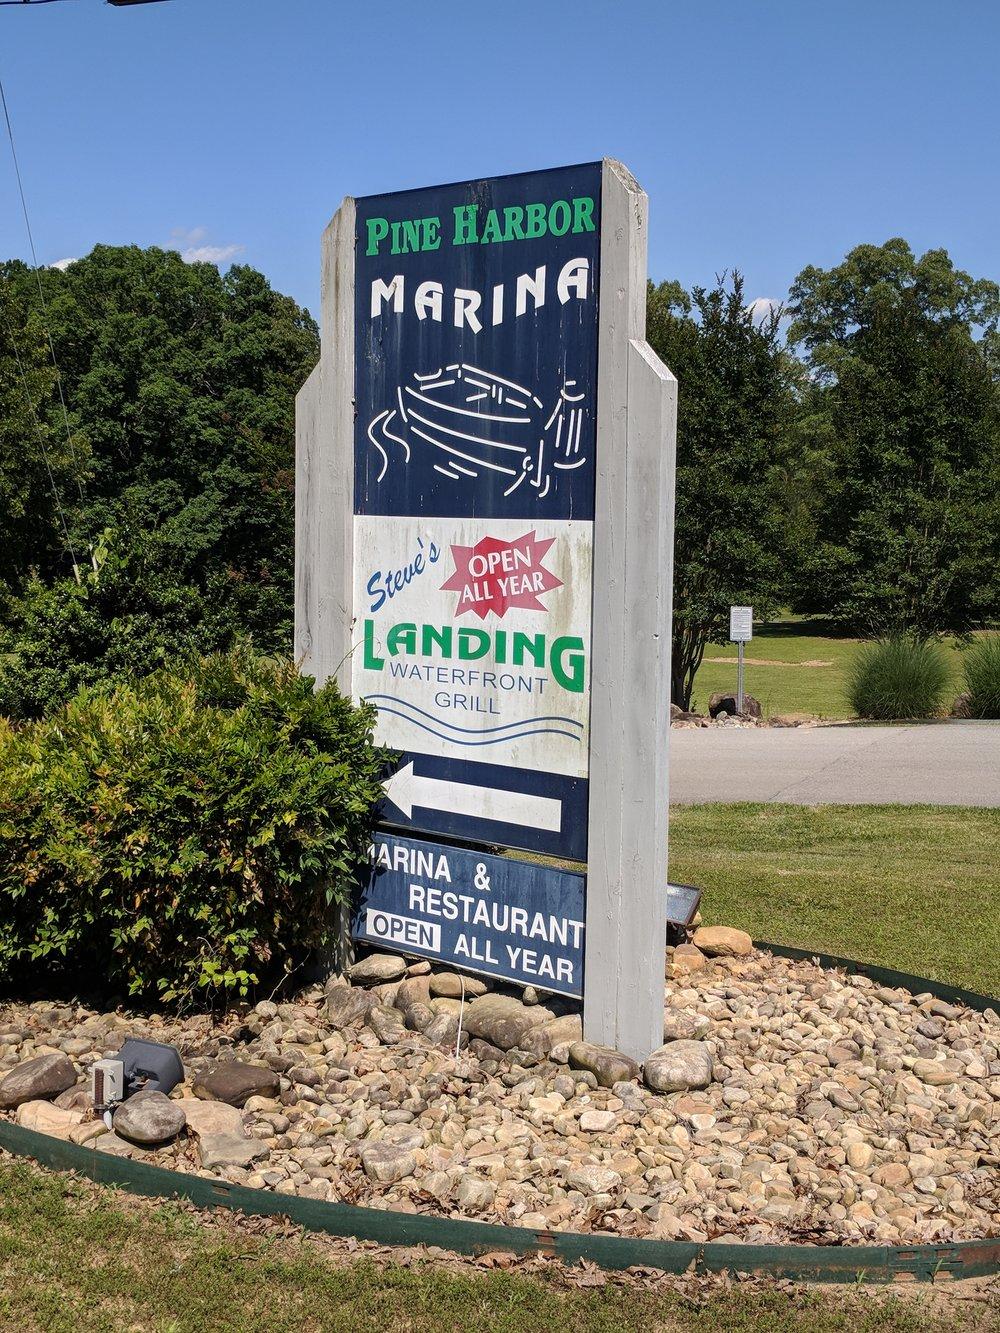 Close to Pine Harbor Marina